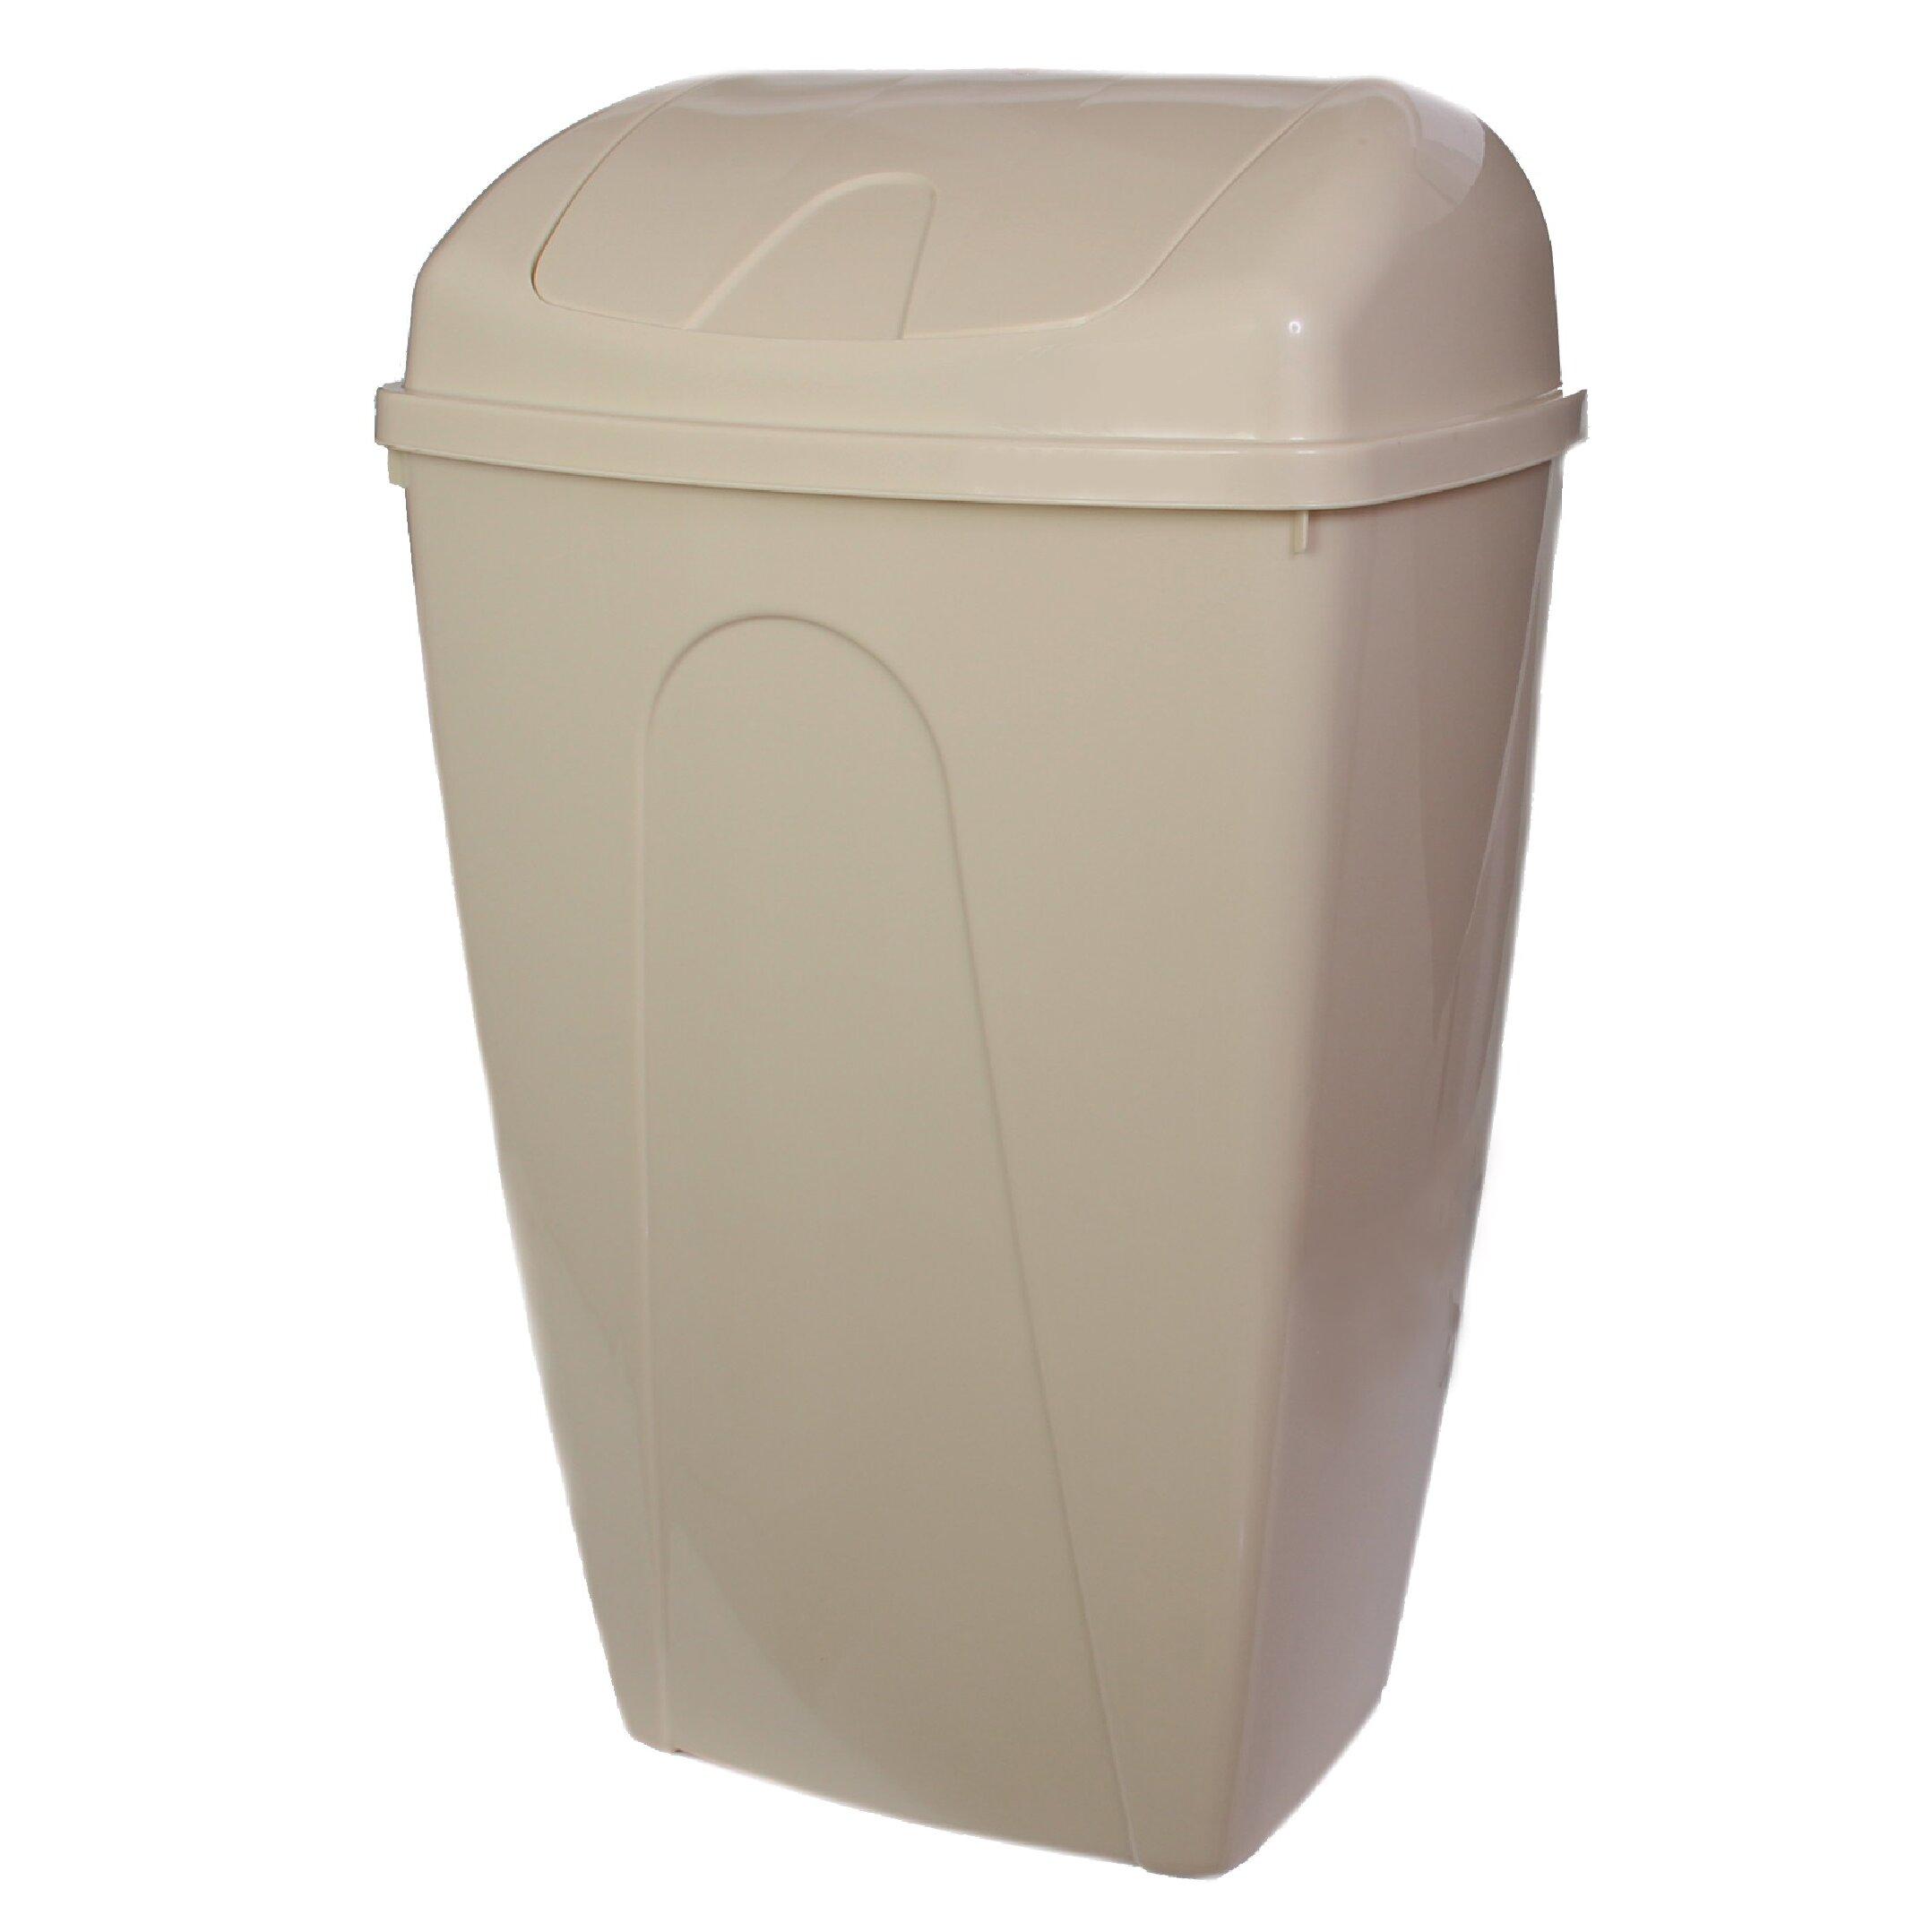 ybm home 13 gallon swing top plastic trash can reviews. Black Bedroom Furniture Sets. Home Design Ideas